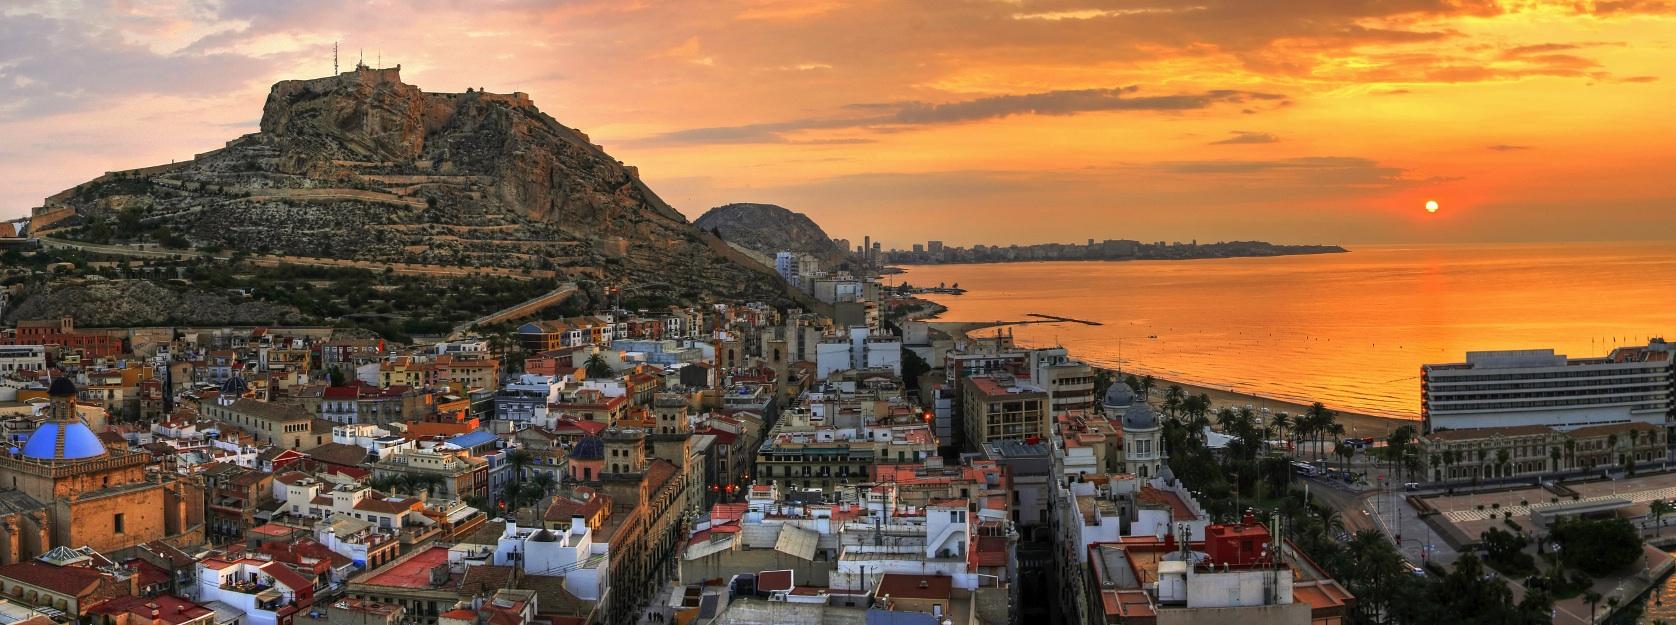 Languatics-Language-Immersion-Spanish-Alicante-Spain.jpg